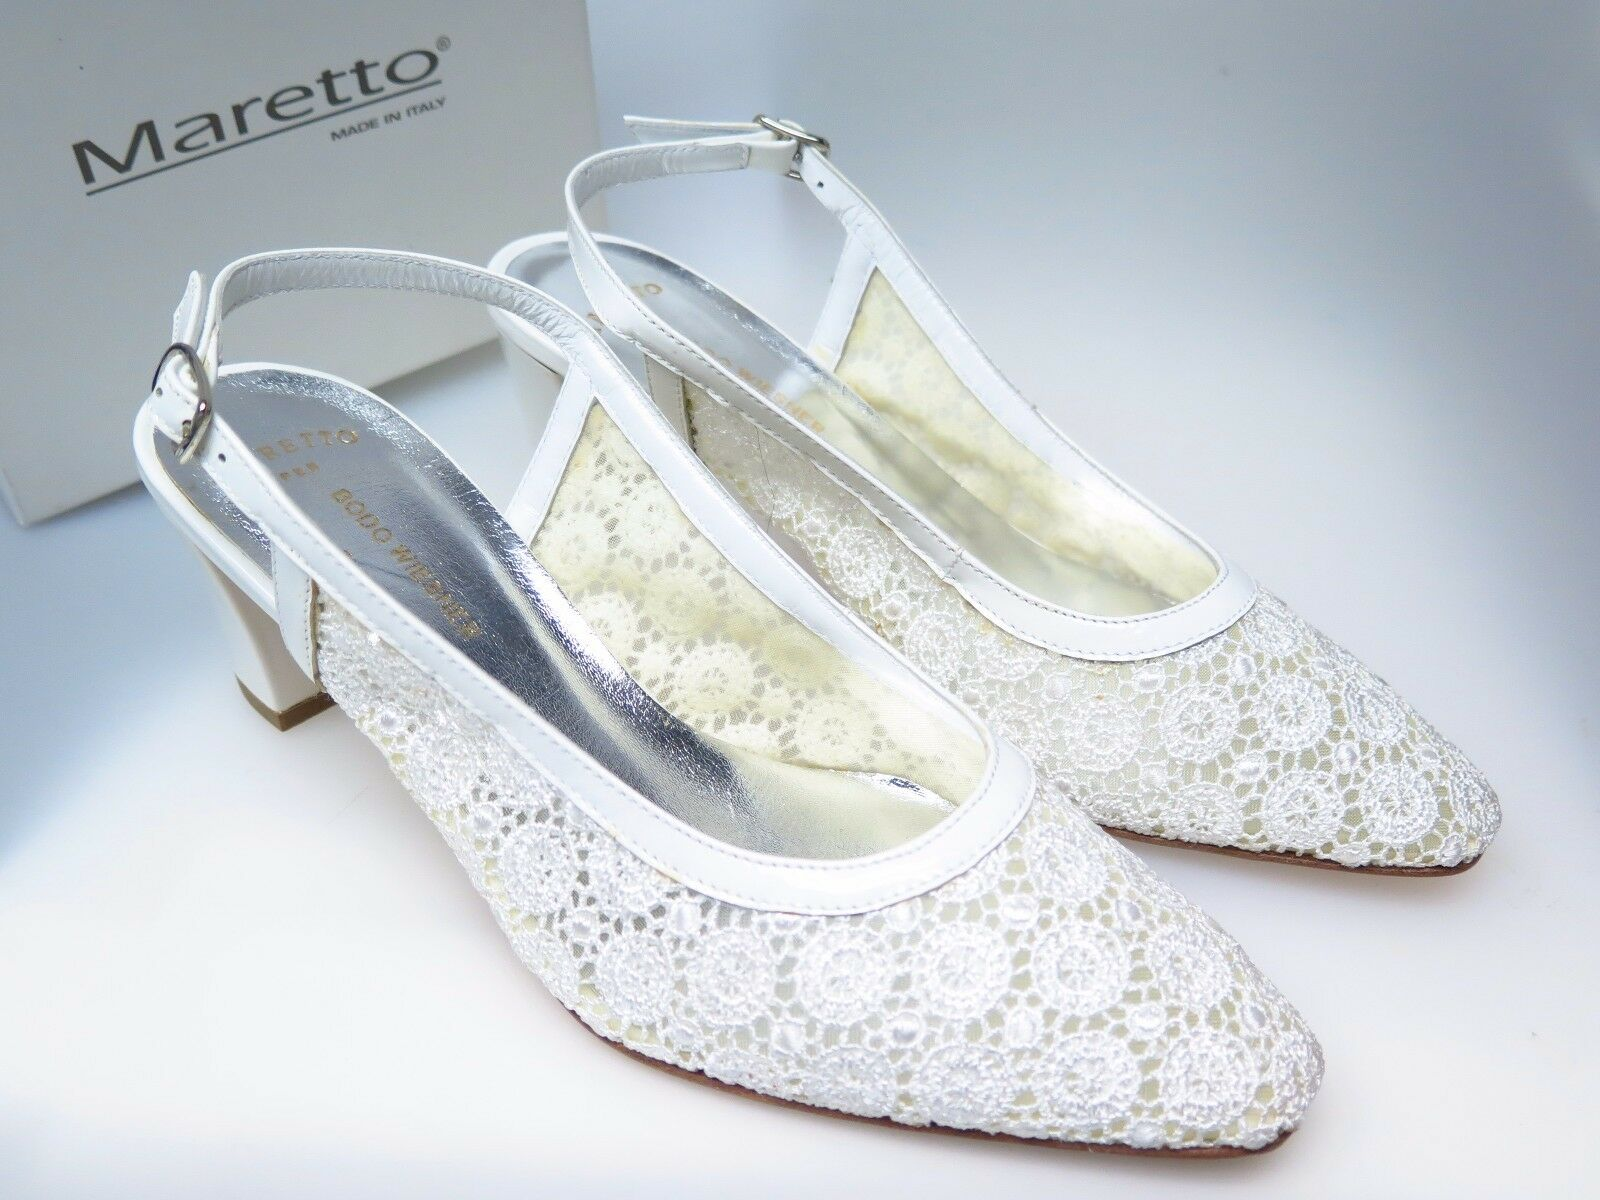 MARETTO  Designer Damenschuhe Chris 6956 Bianco Vernice F57 Gr. 37,5 NEU